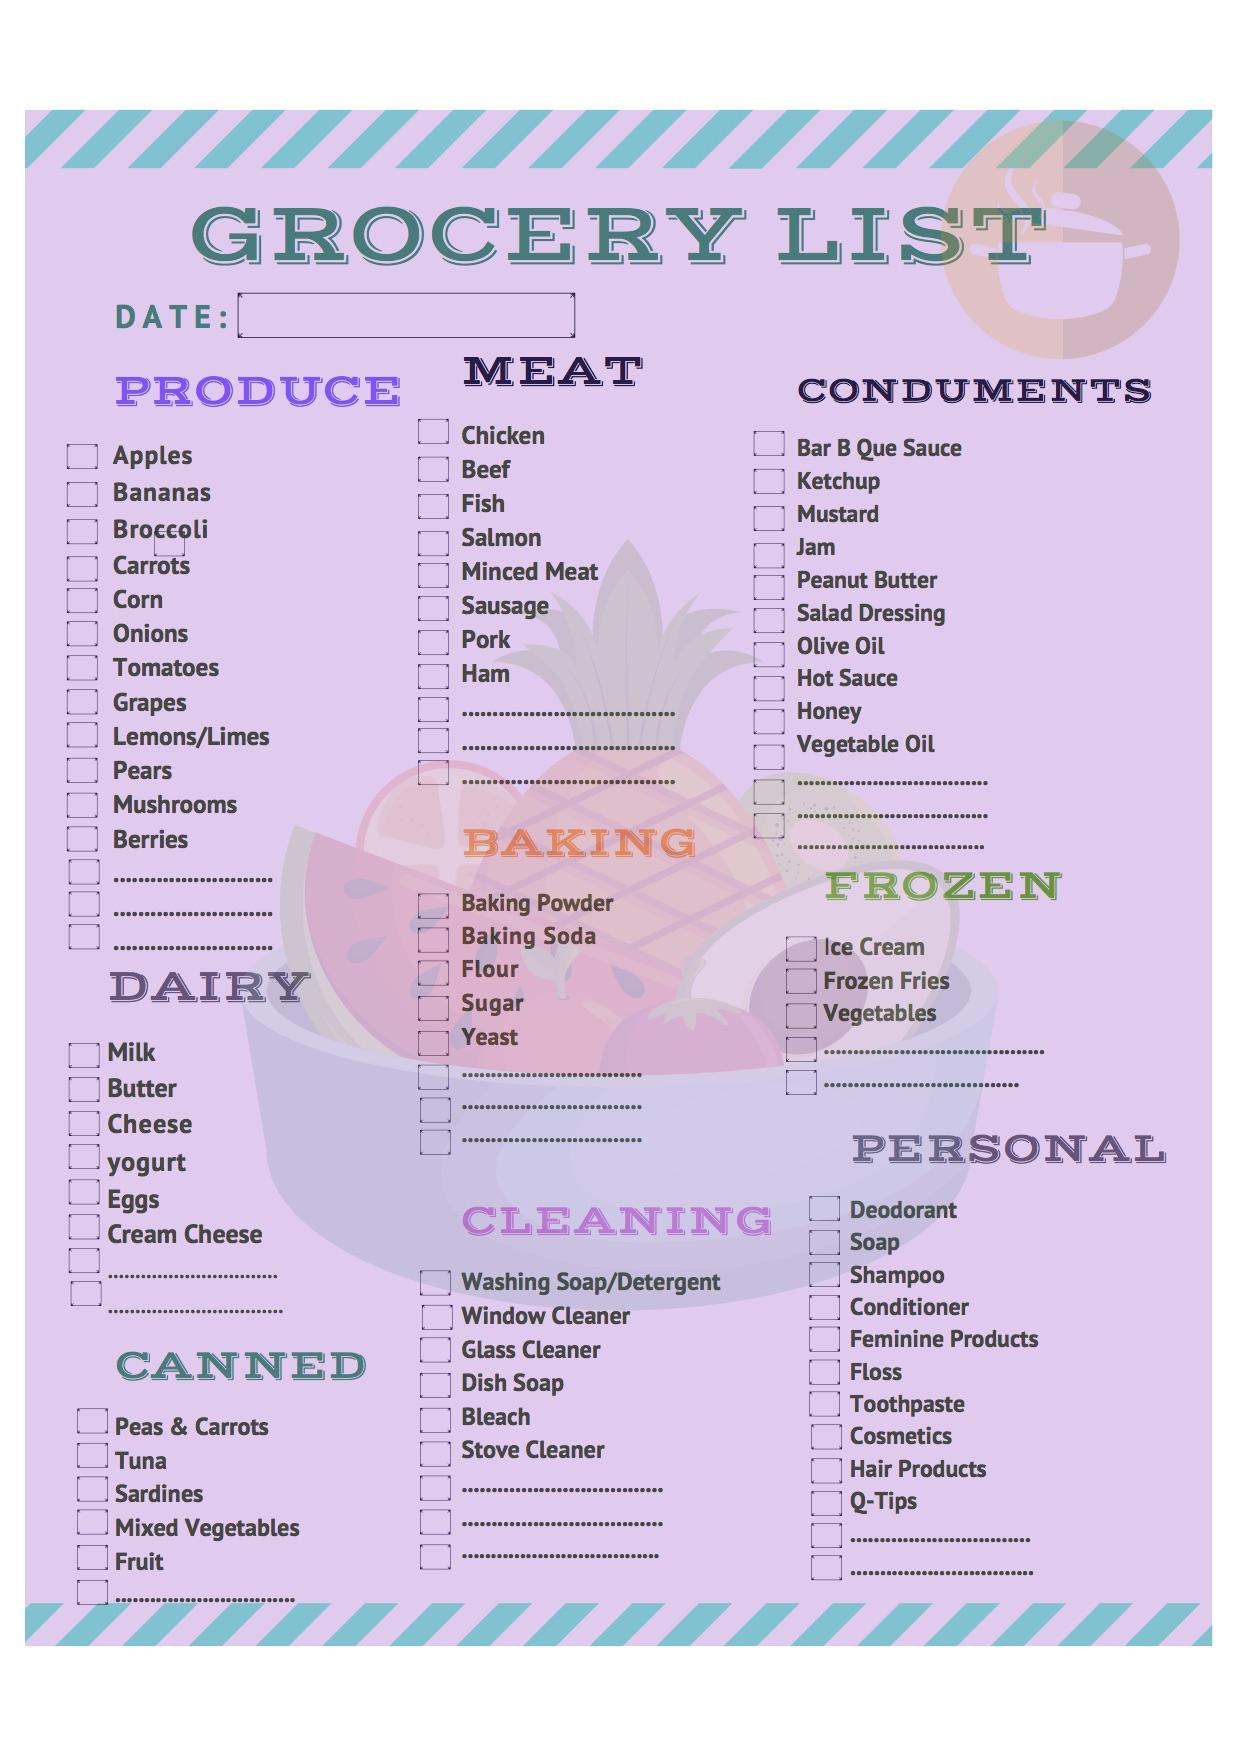 Grocery List2